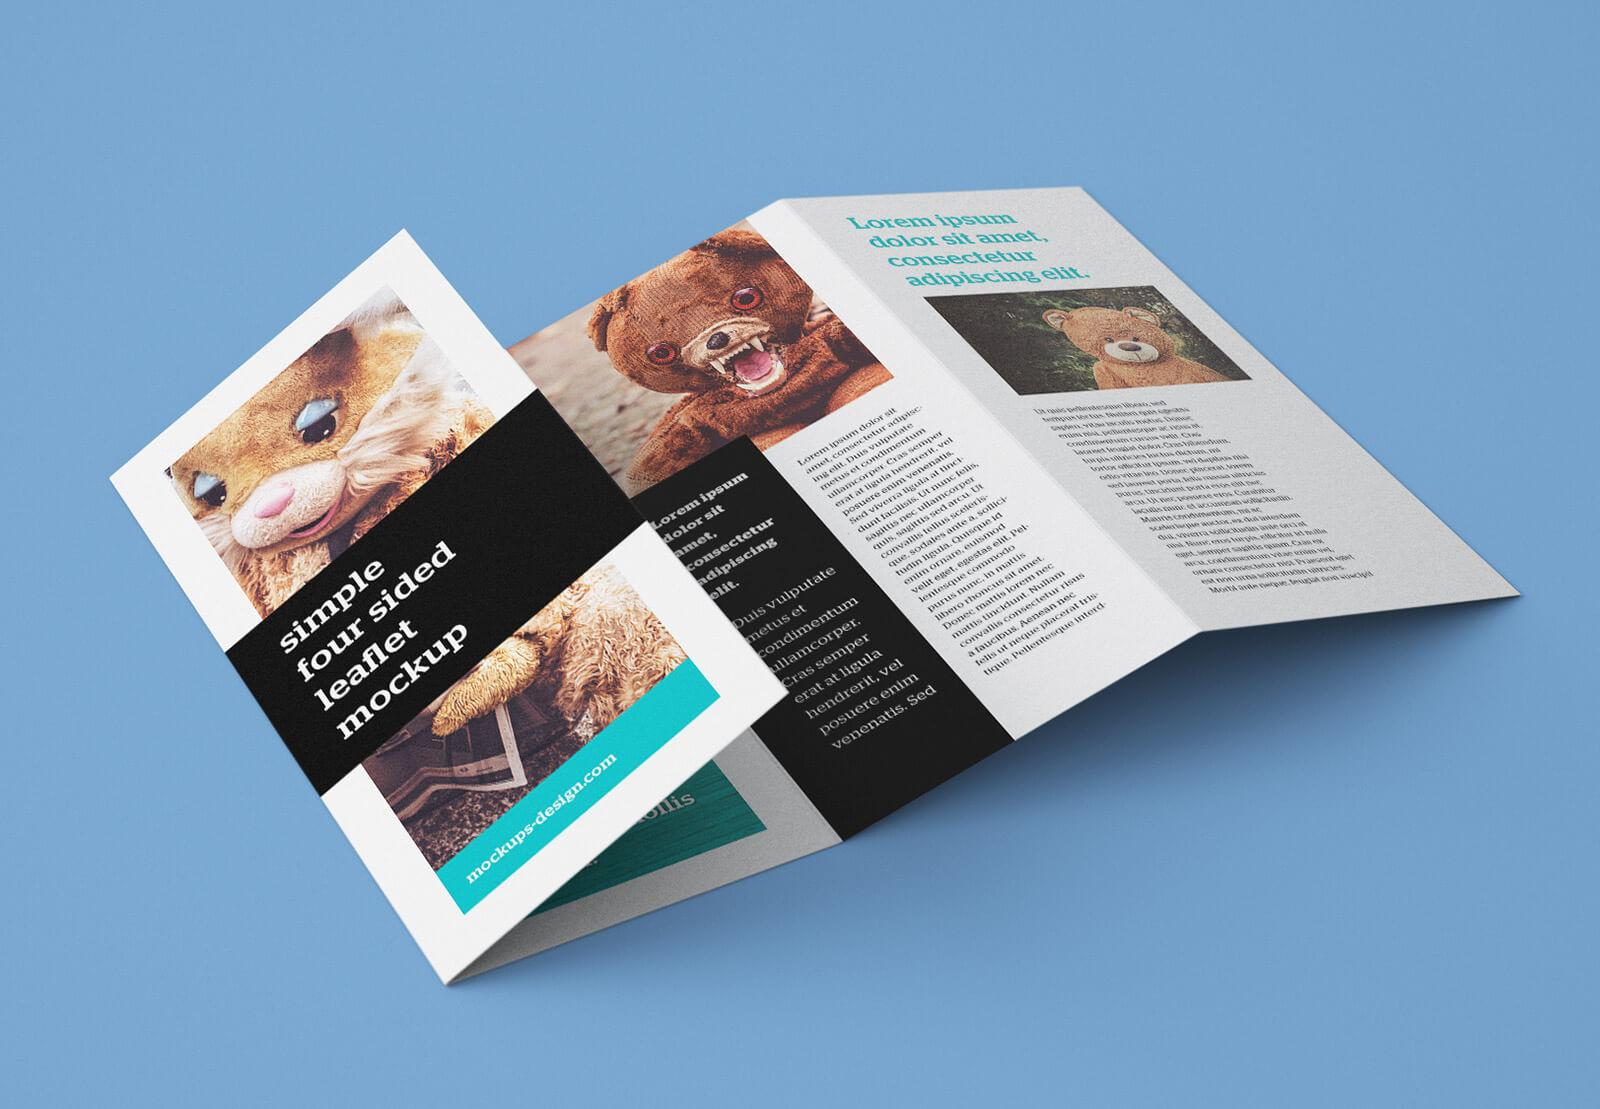 Free Accordion 4 Fold Brochure / Leaflet Mockup Psd With 4 Fold Brochure Template